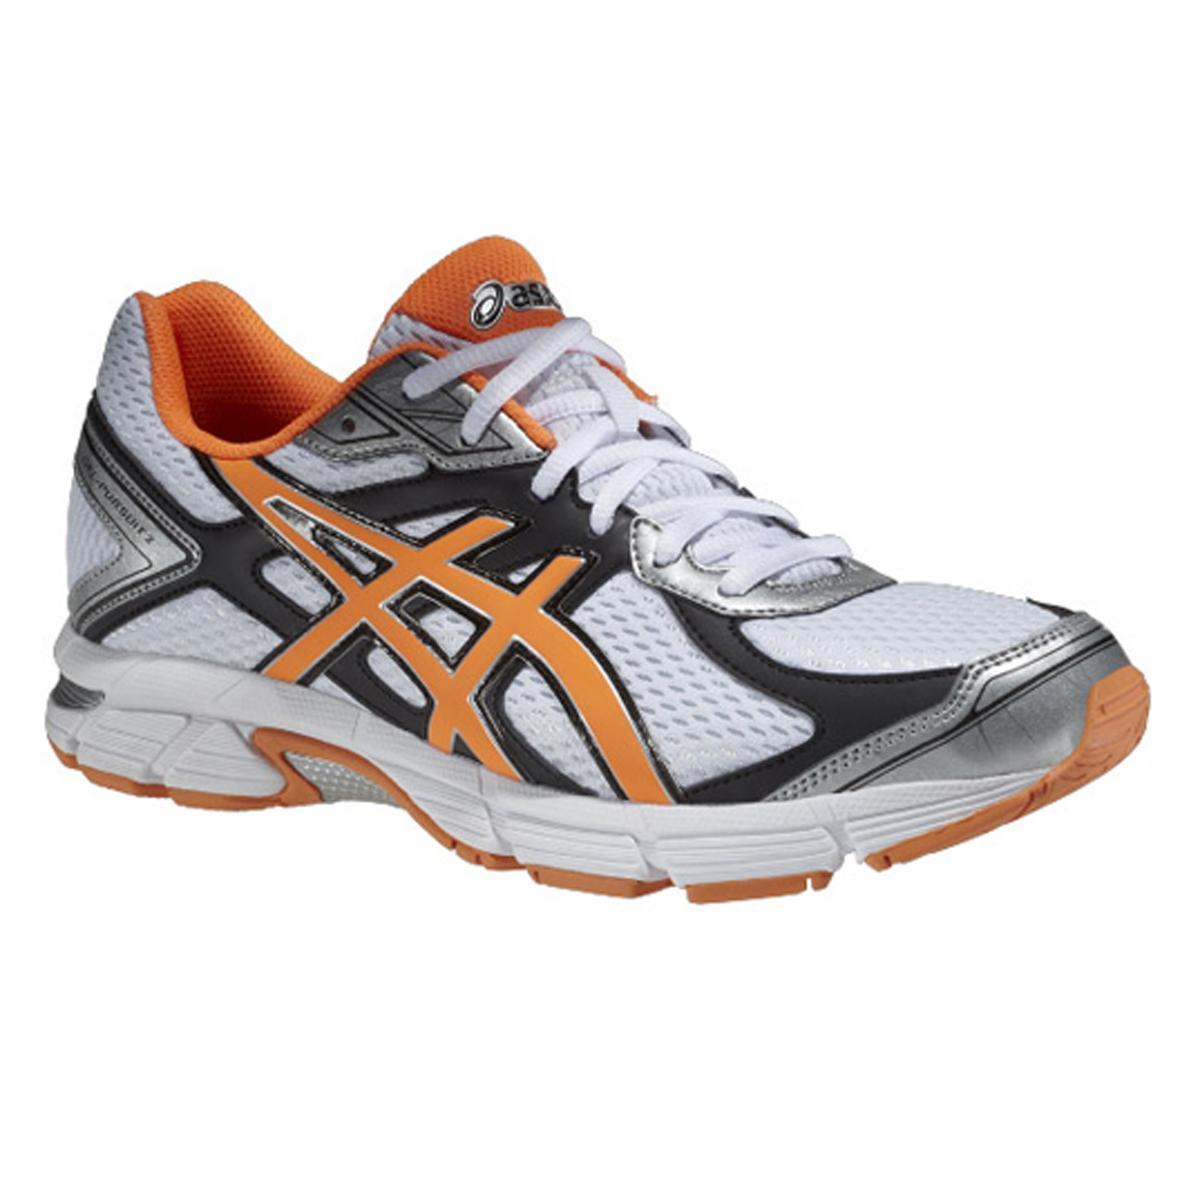 Asics Mens GEL Pursuit 2 Running Shoes